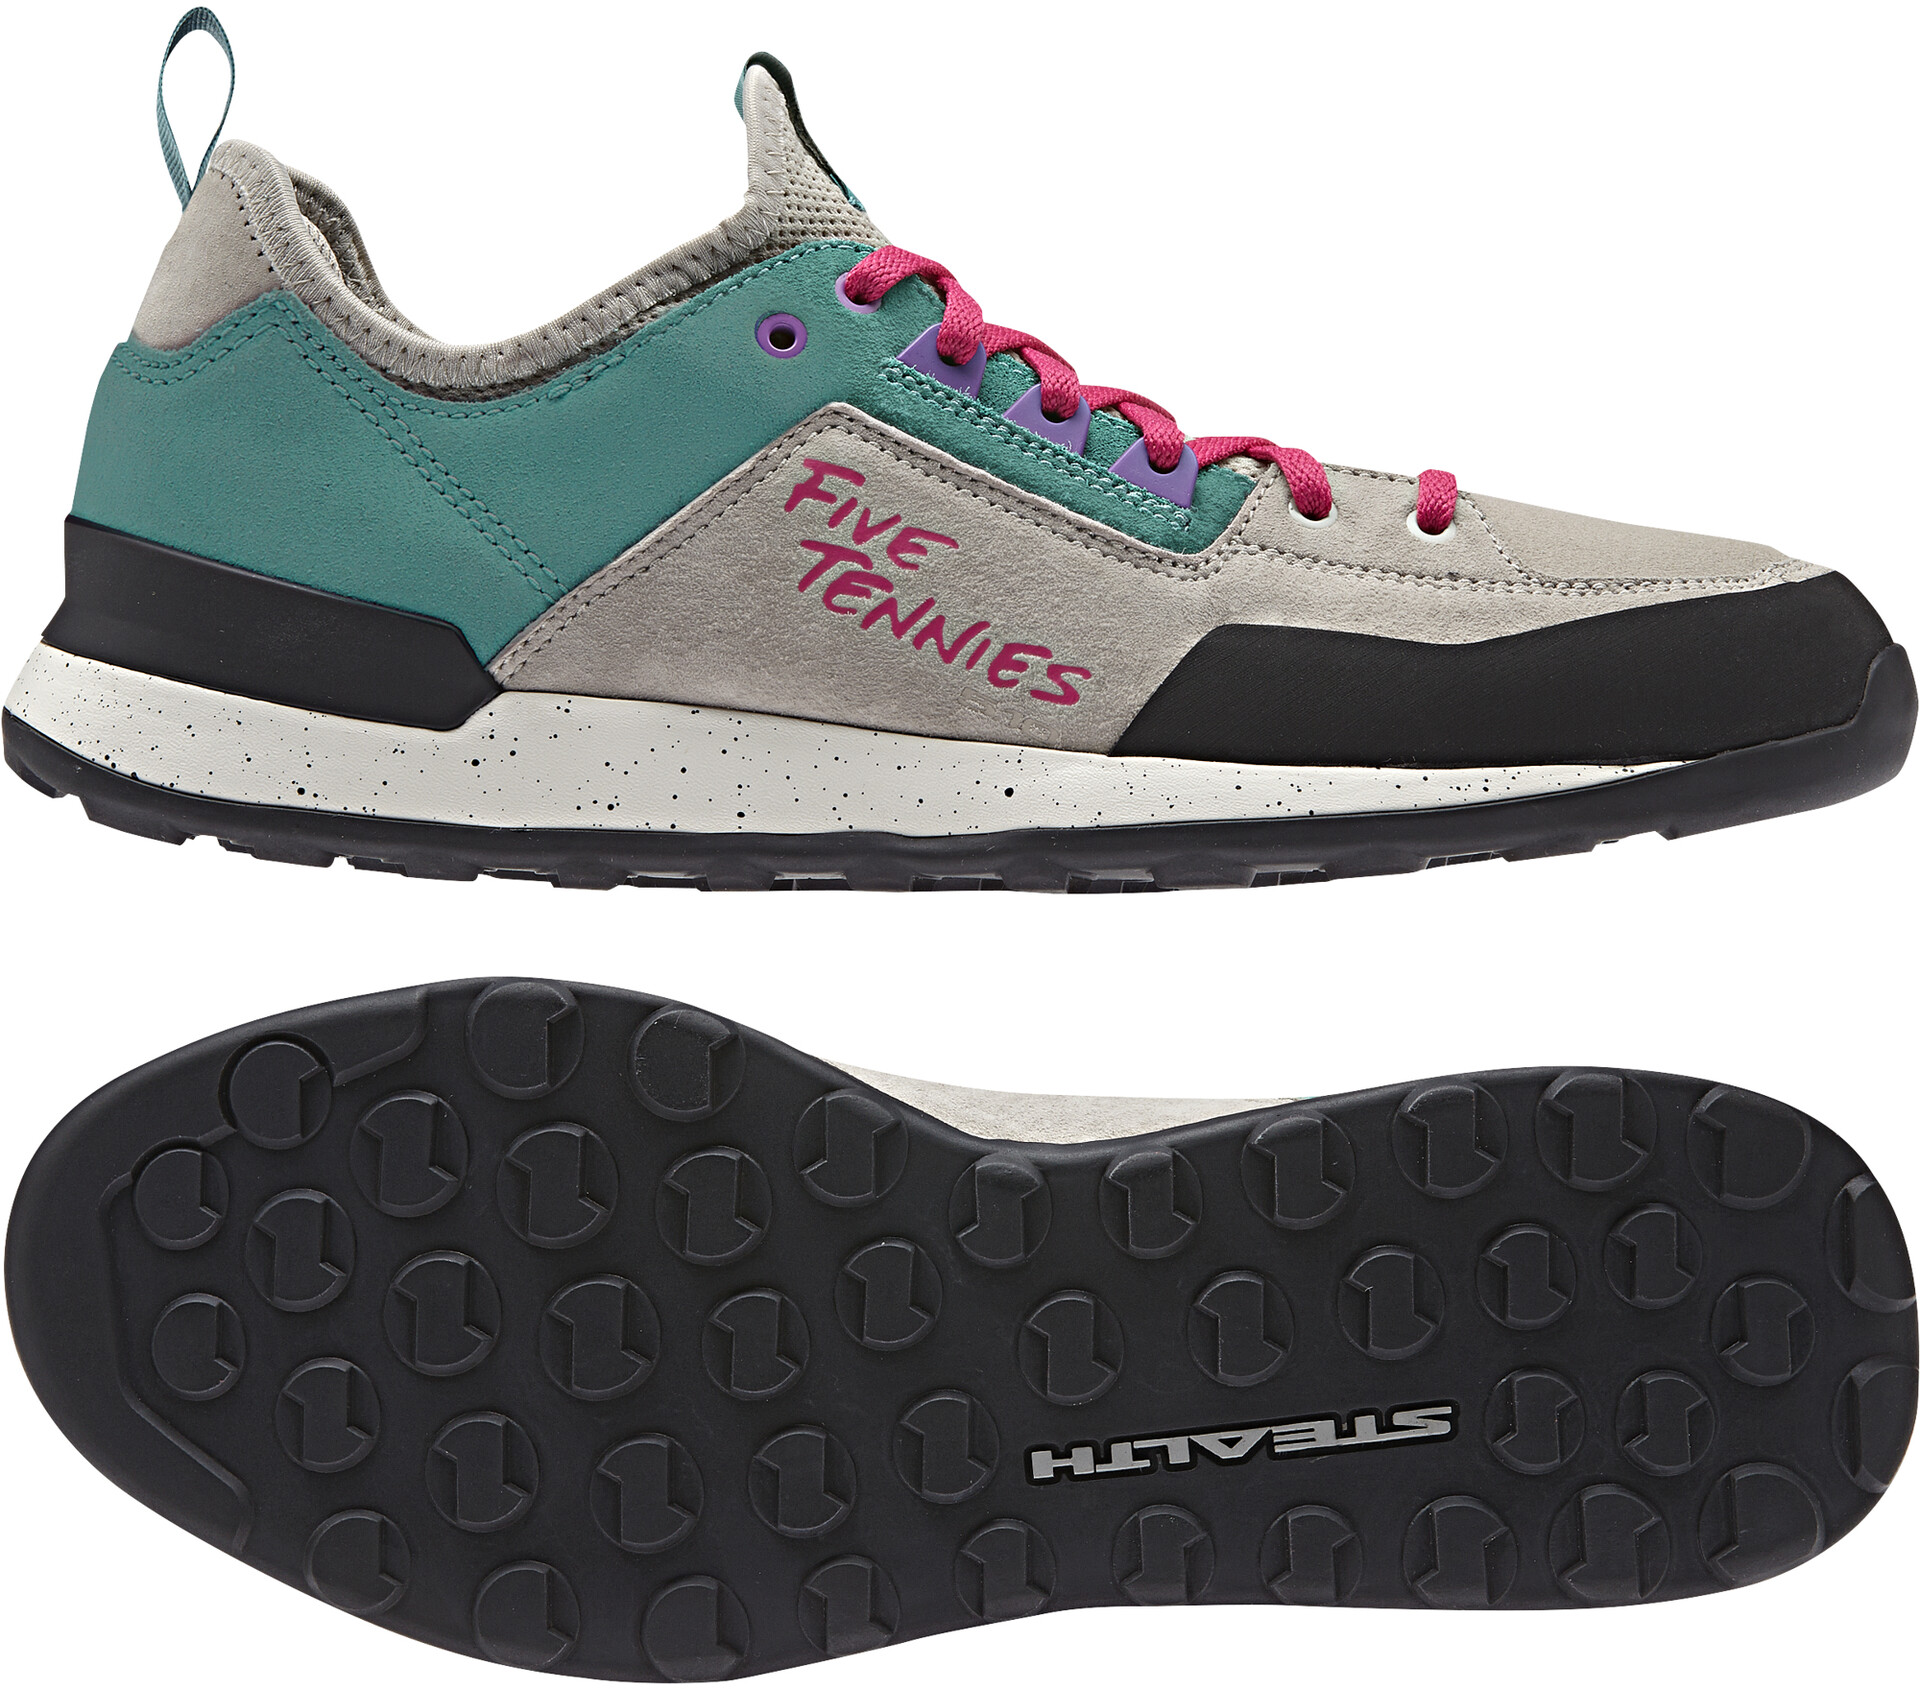 adidas Five Ten Five Tennie Approach Shoes Green | adidas